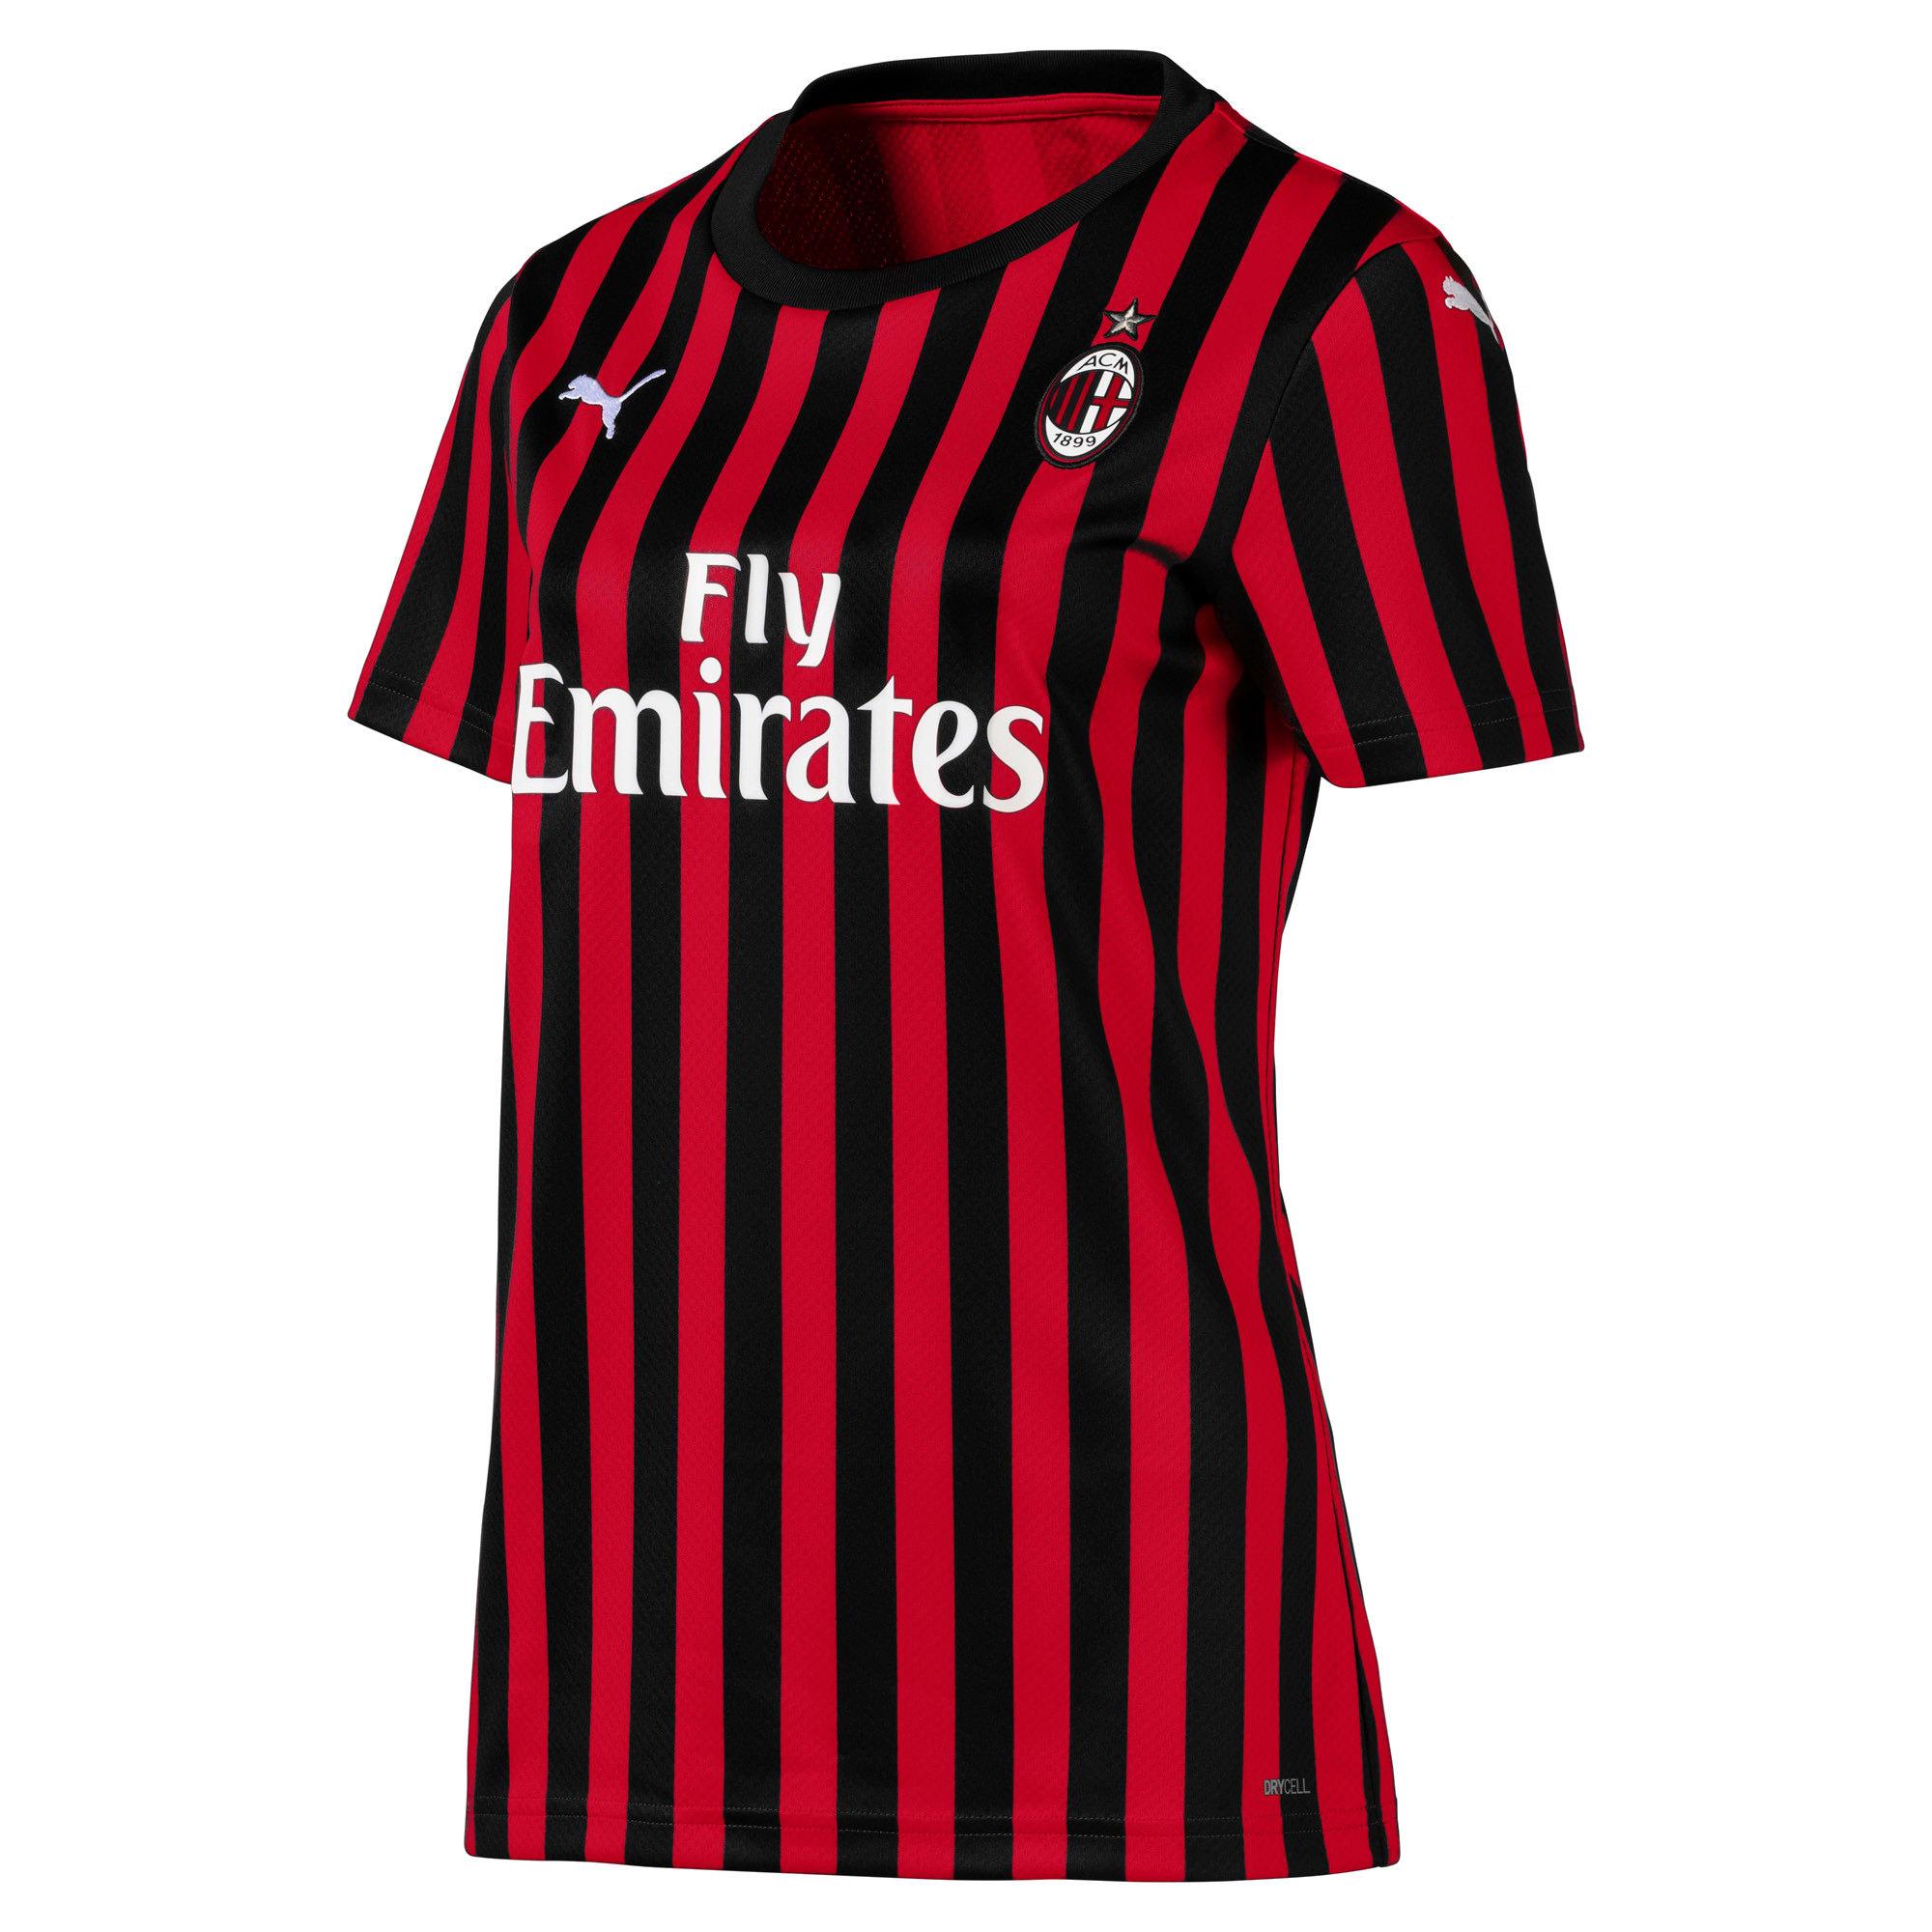 Thumbnail 1 of AC Milan Home Replica Short Sleeve Women's Jersey, Tango Red -Puma Black, medium